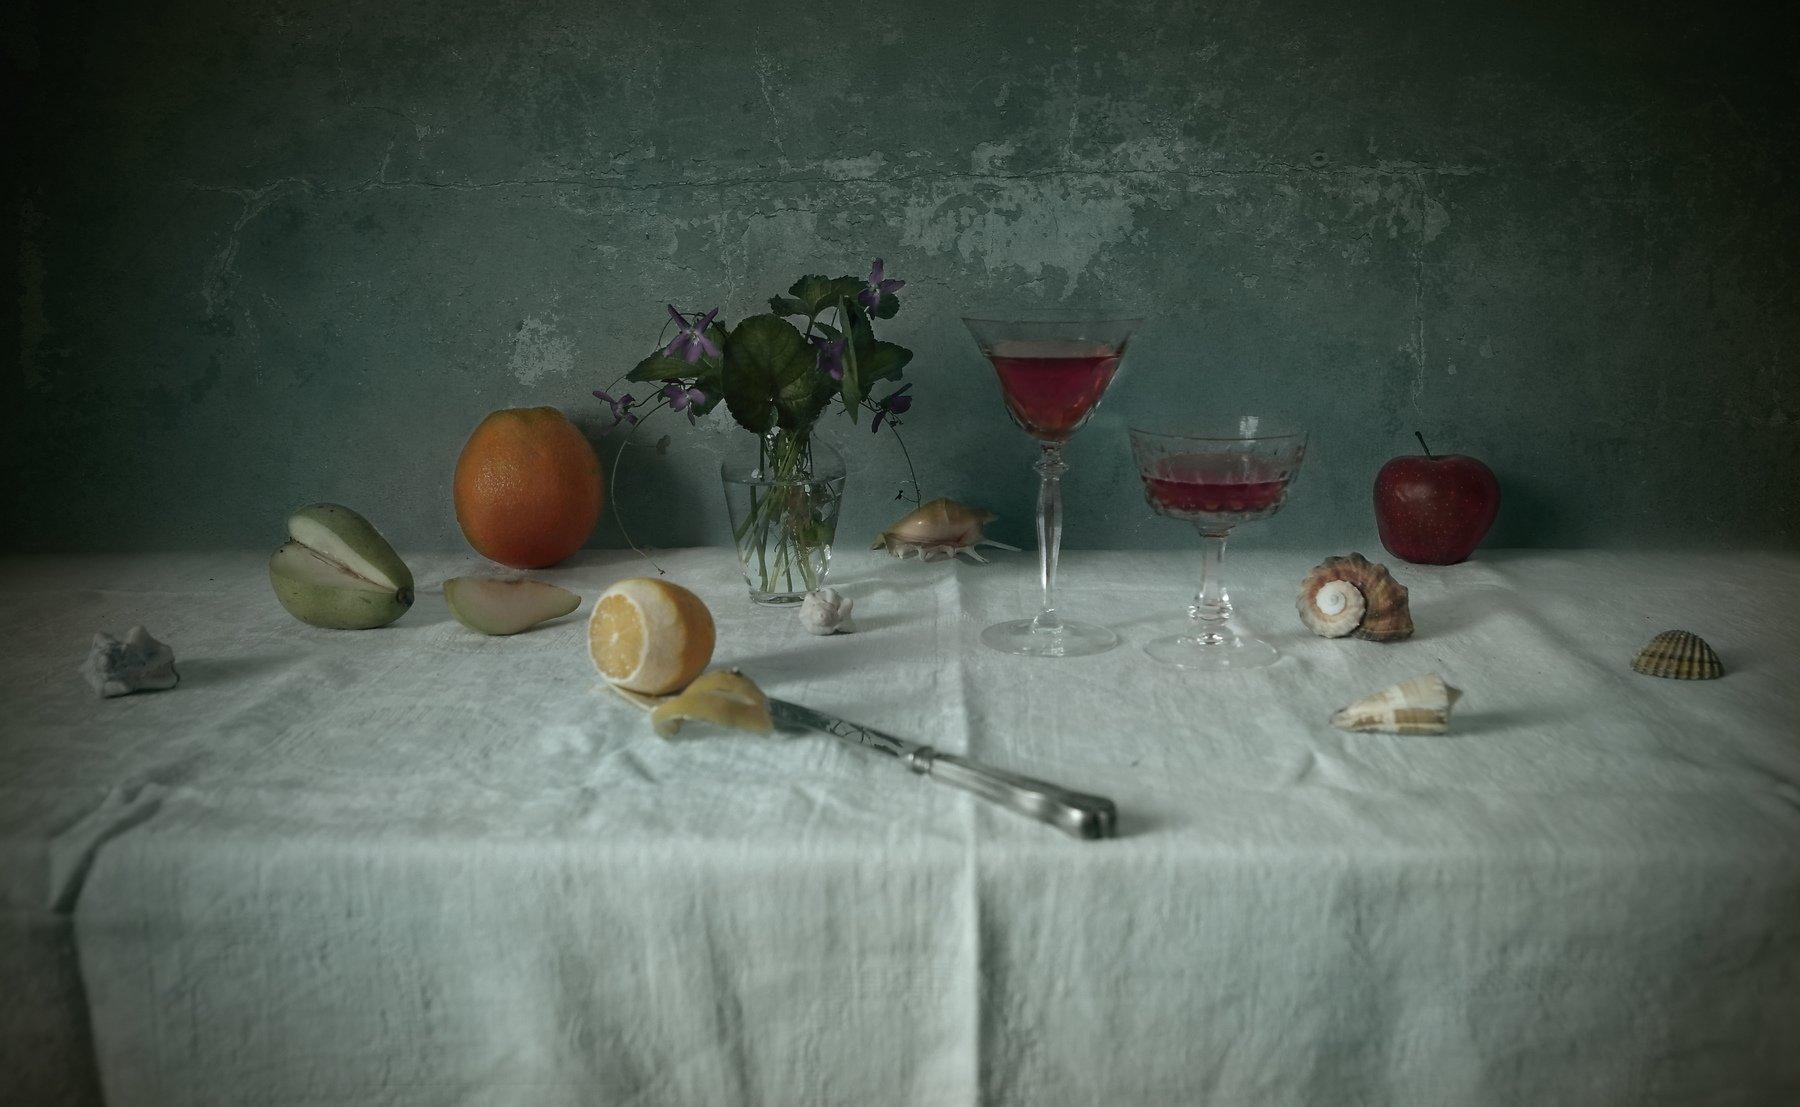 wine, fruits, shells, lemon, orange, apple, glass, texture, Andrei Blank